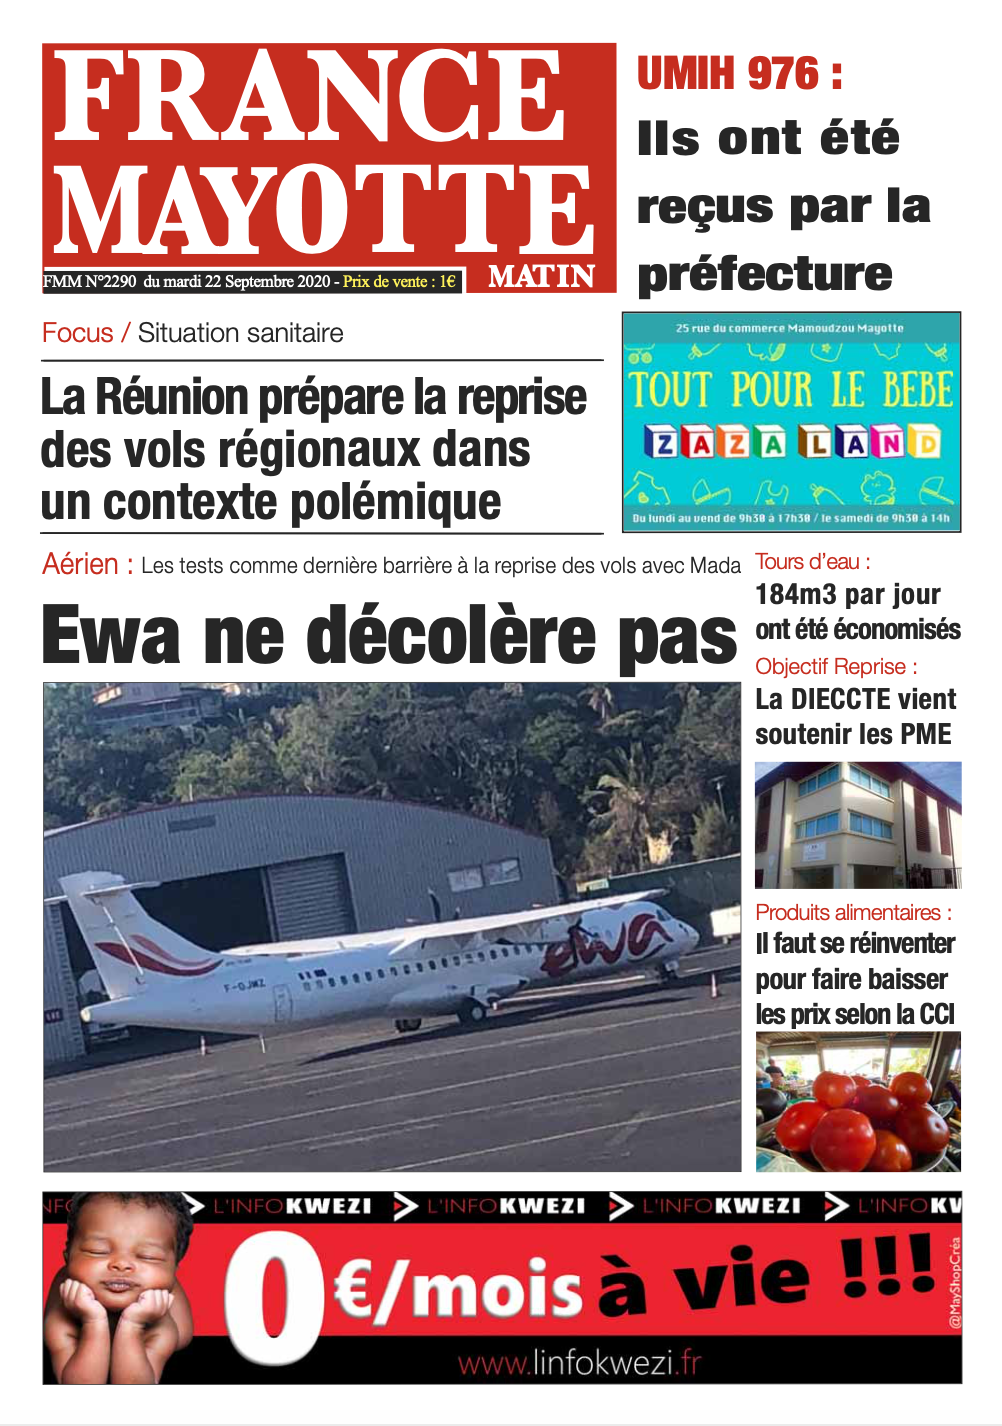 France Mayotte Mardi 22 septembre 2020